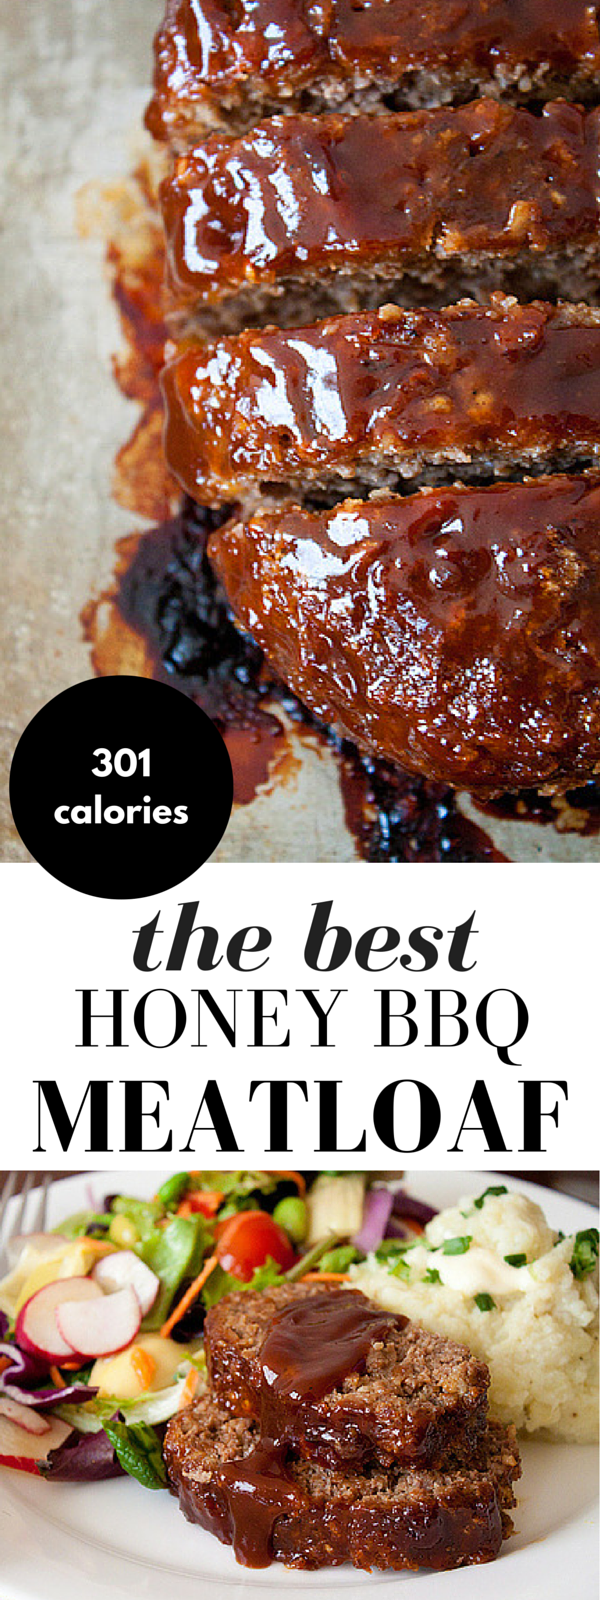 The Best Honey Barbecue Meatloaf Recipe Recipe Beef Recipes Easy Barbecue Meatloaf Recipes Recipes